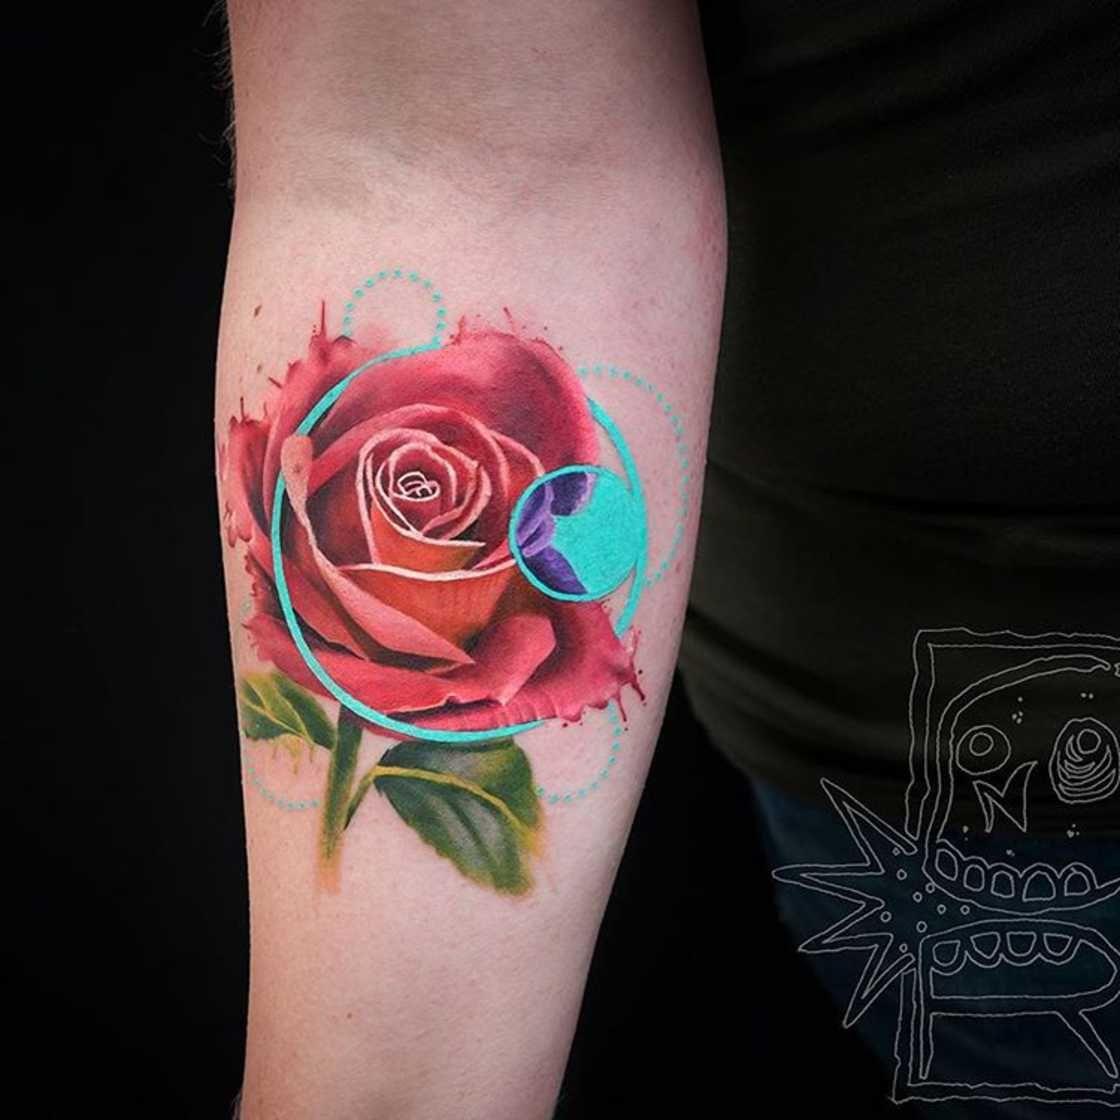 Pin De Andrew Mougios En Tattoos: 23 Tatuajes Que Mezclan Técnicas Y Estilos Por Chris